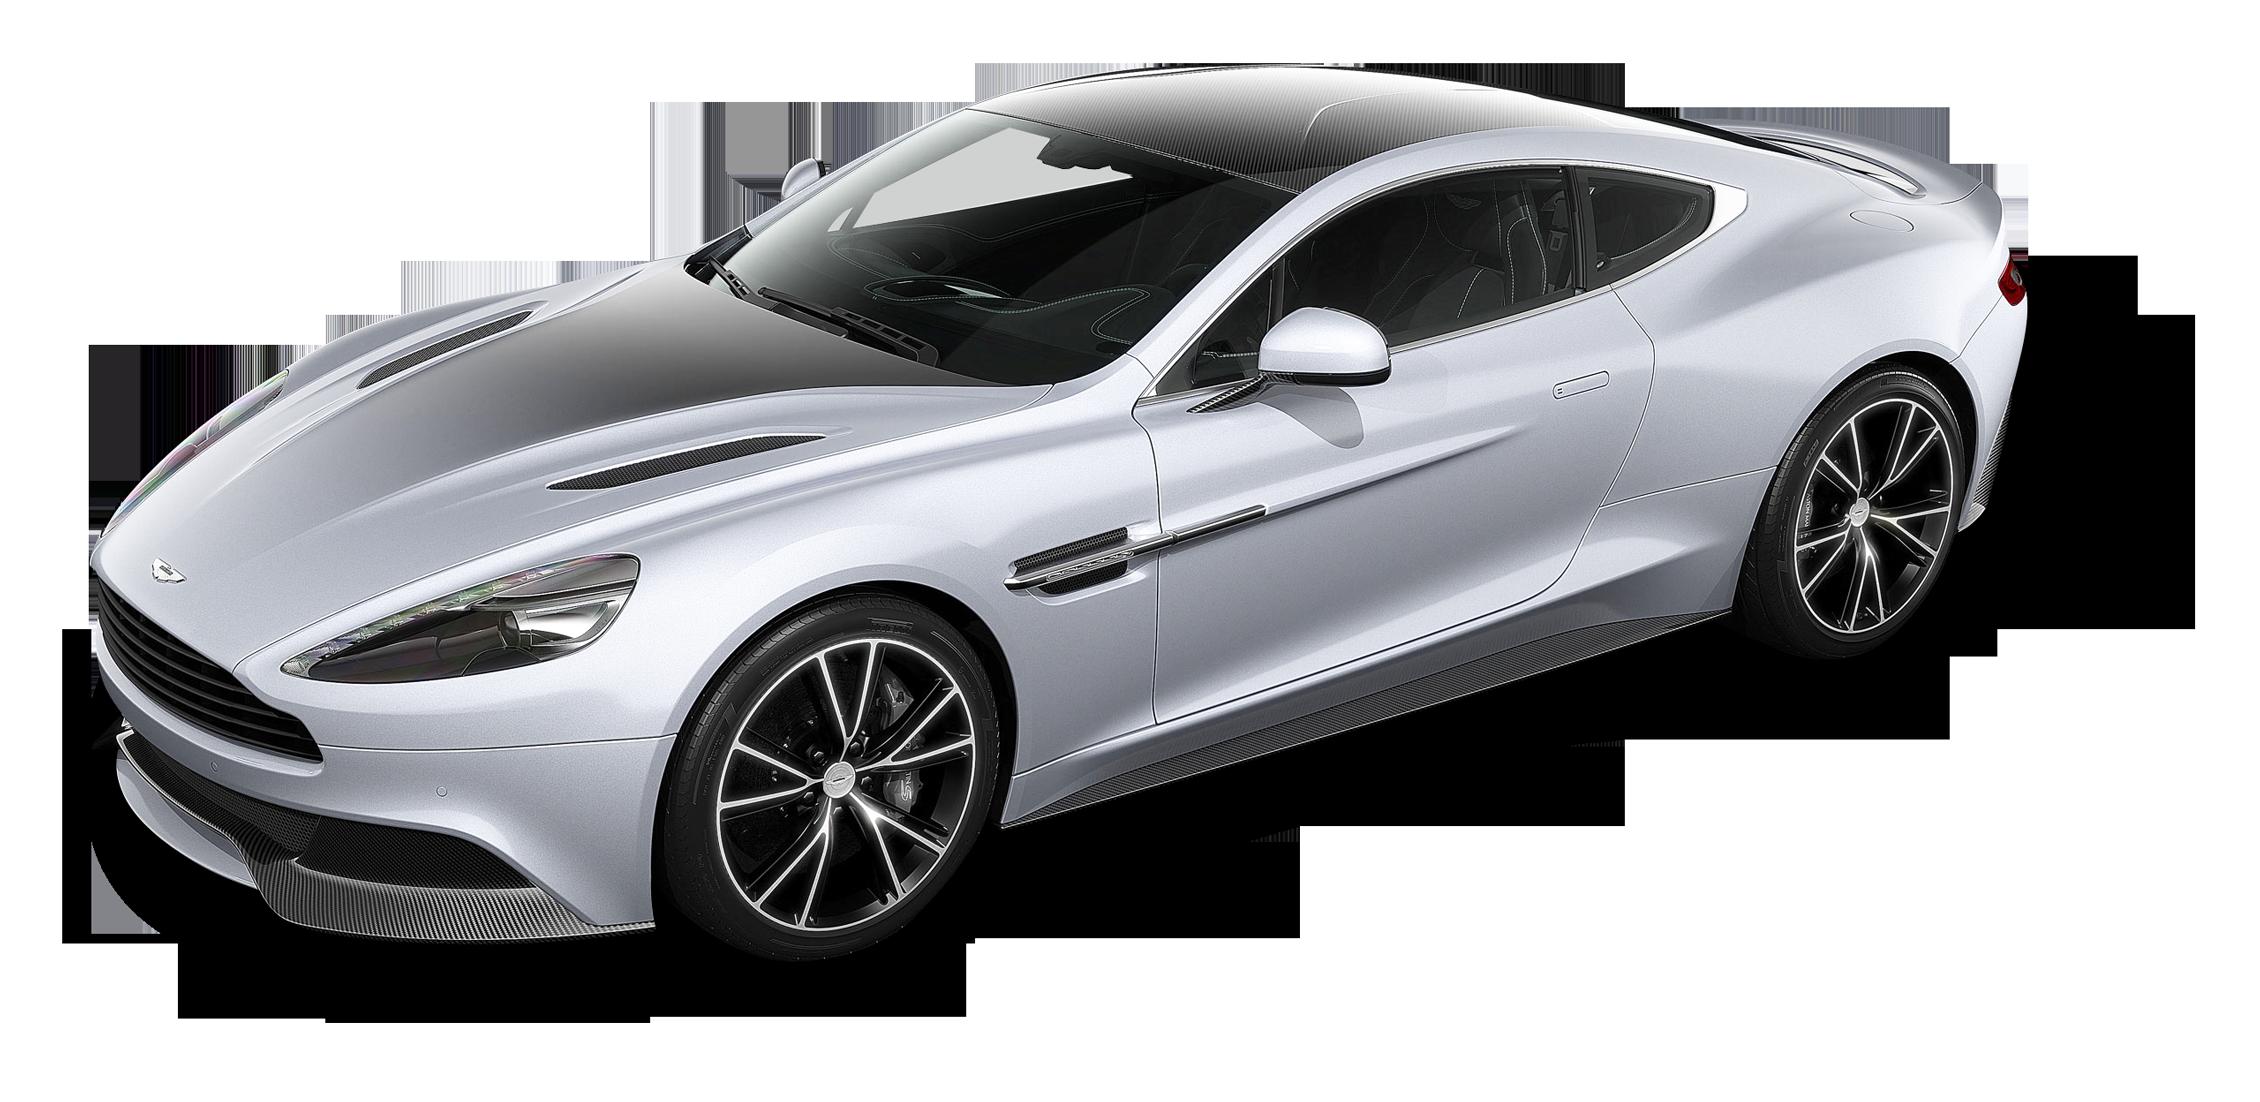 Aston Martin Vanquish CE Silver Car